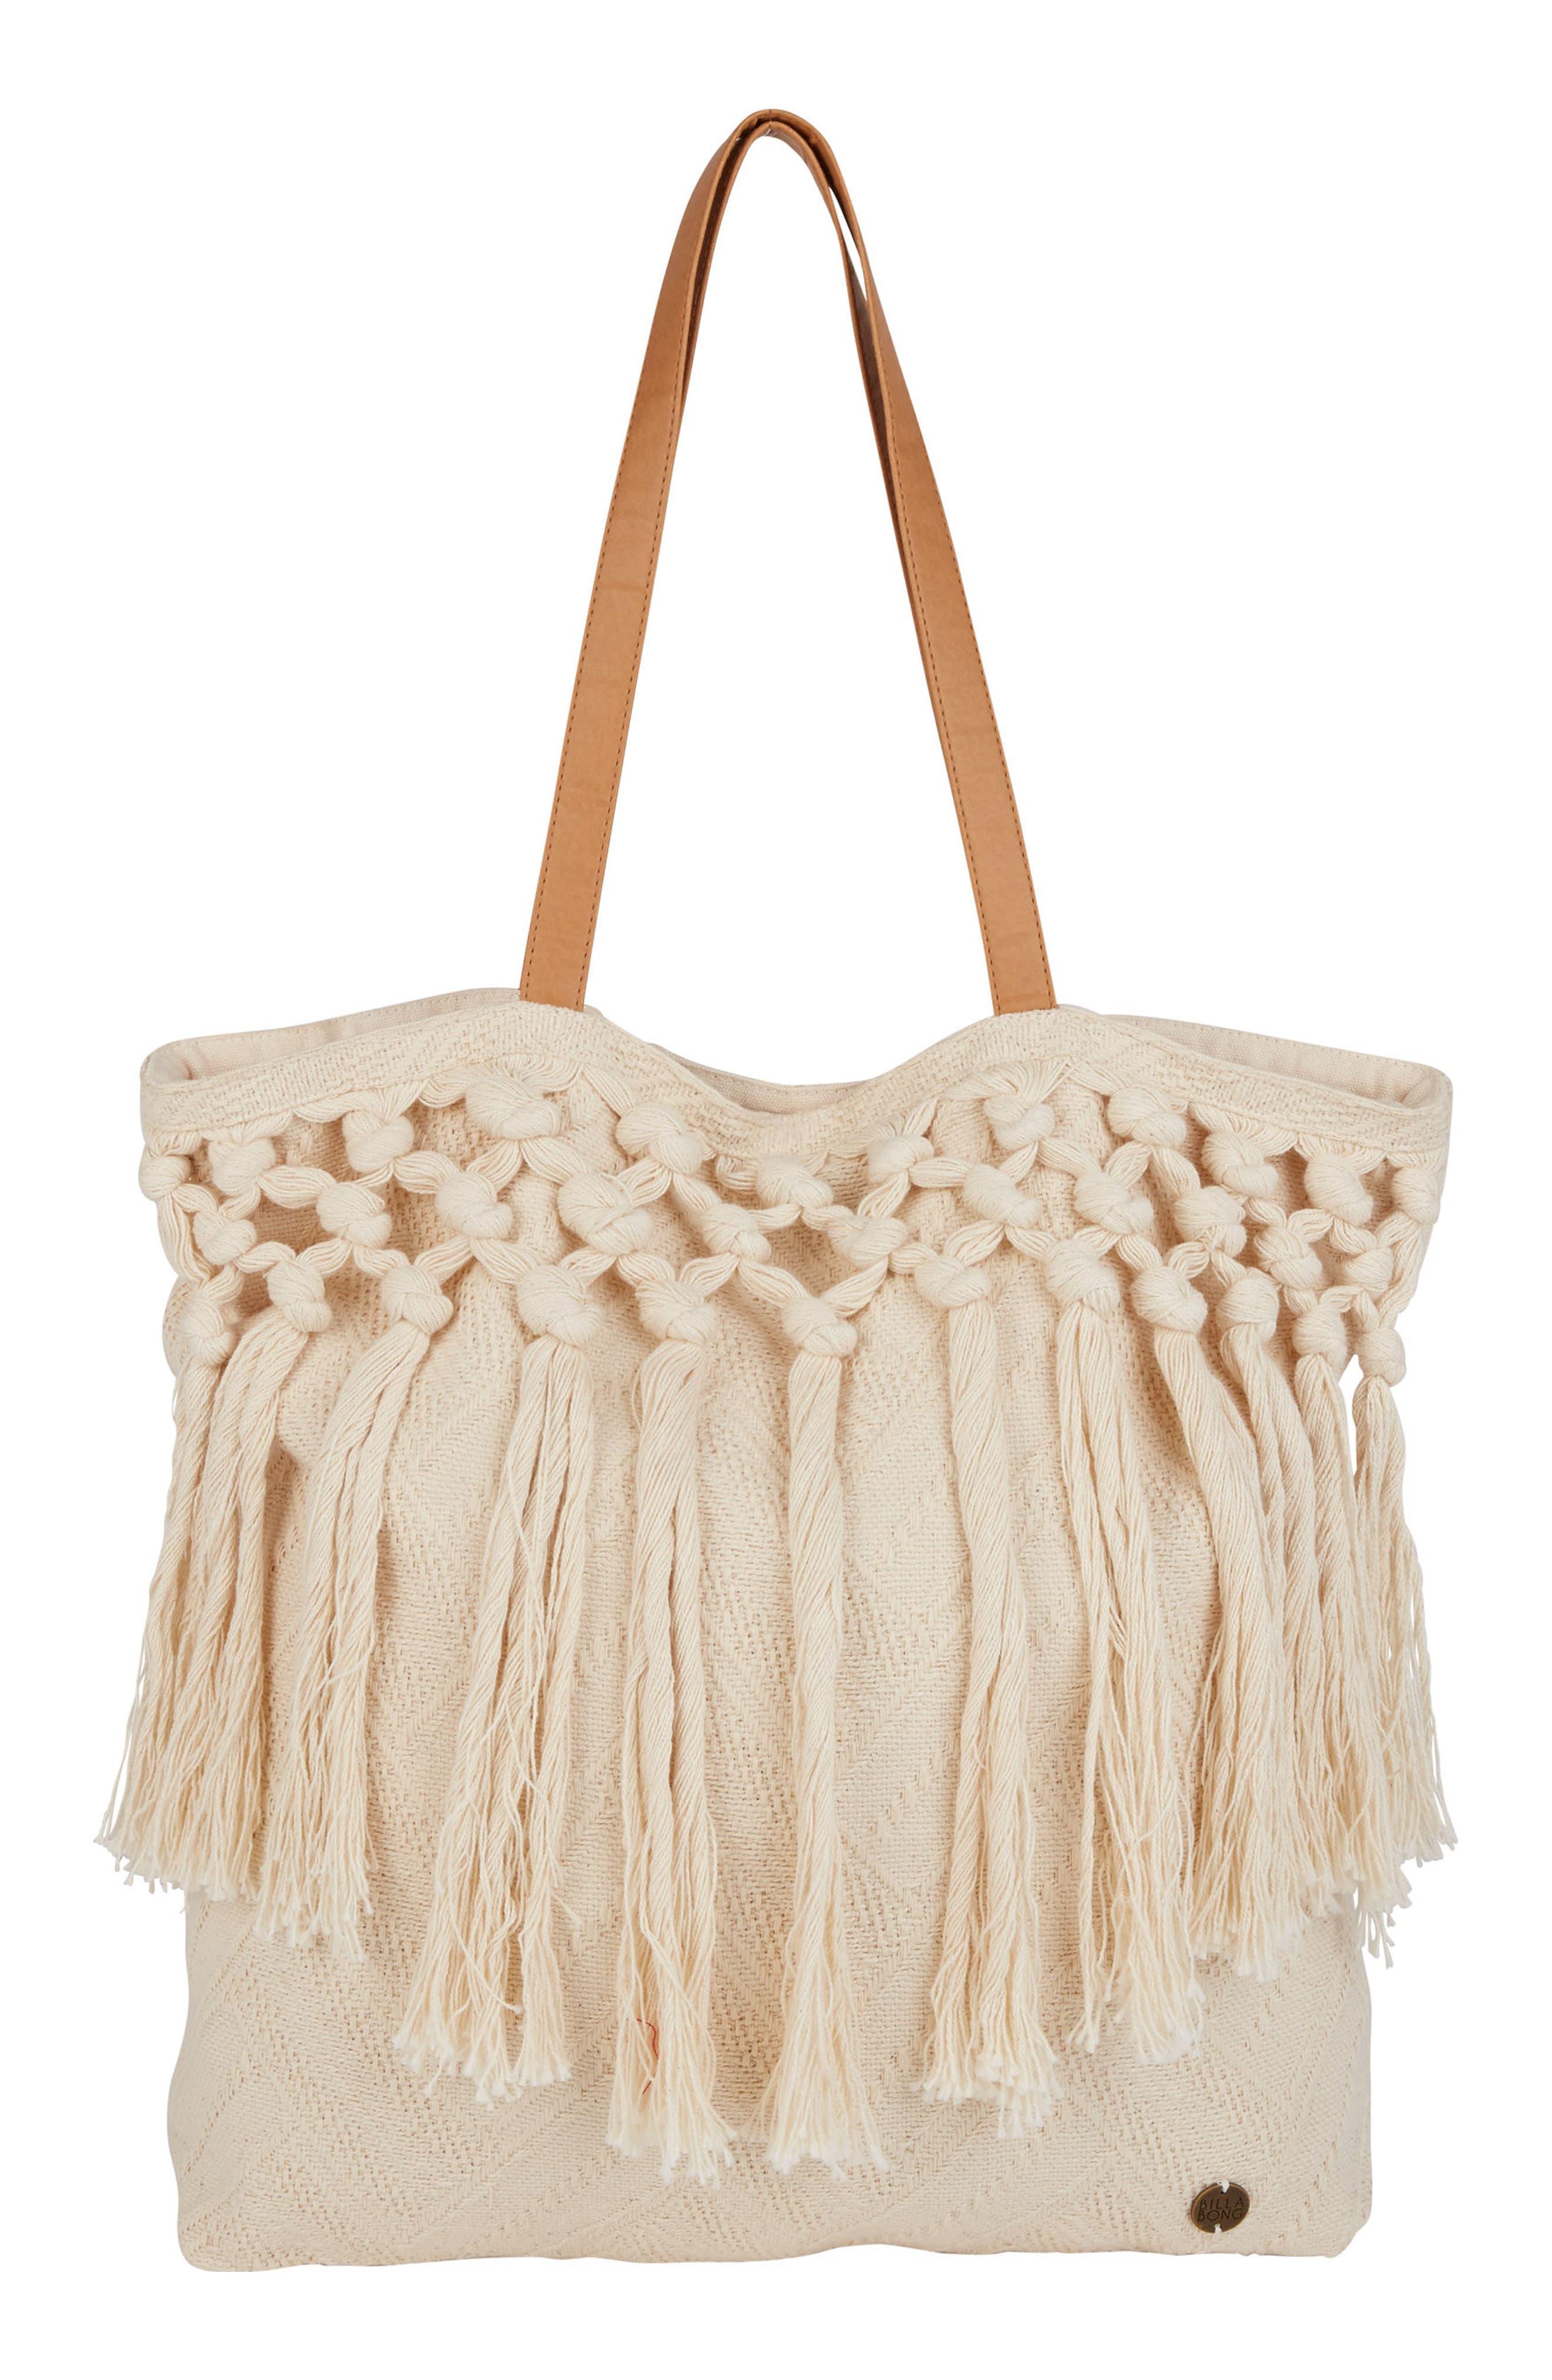 Billabong To the Limit Tote Bag